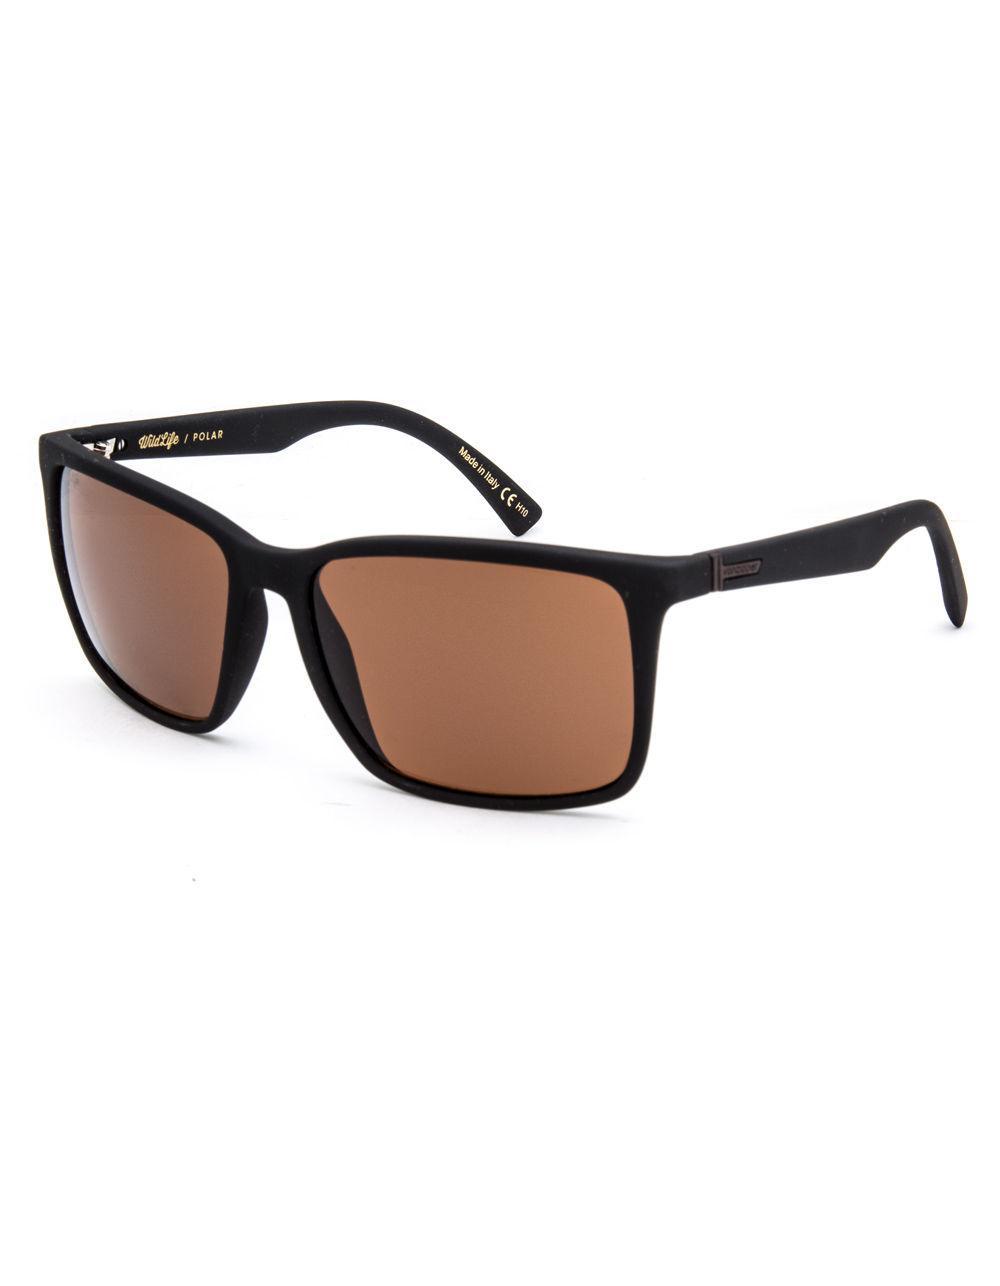 f8cd44542f1 Von Zipper. Men s Lesmore Wildlife Black Soft Satin   Bronze Polarized  Sunglasses